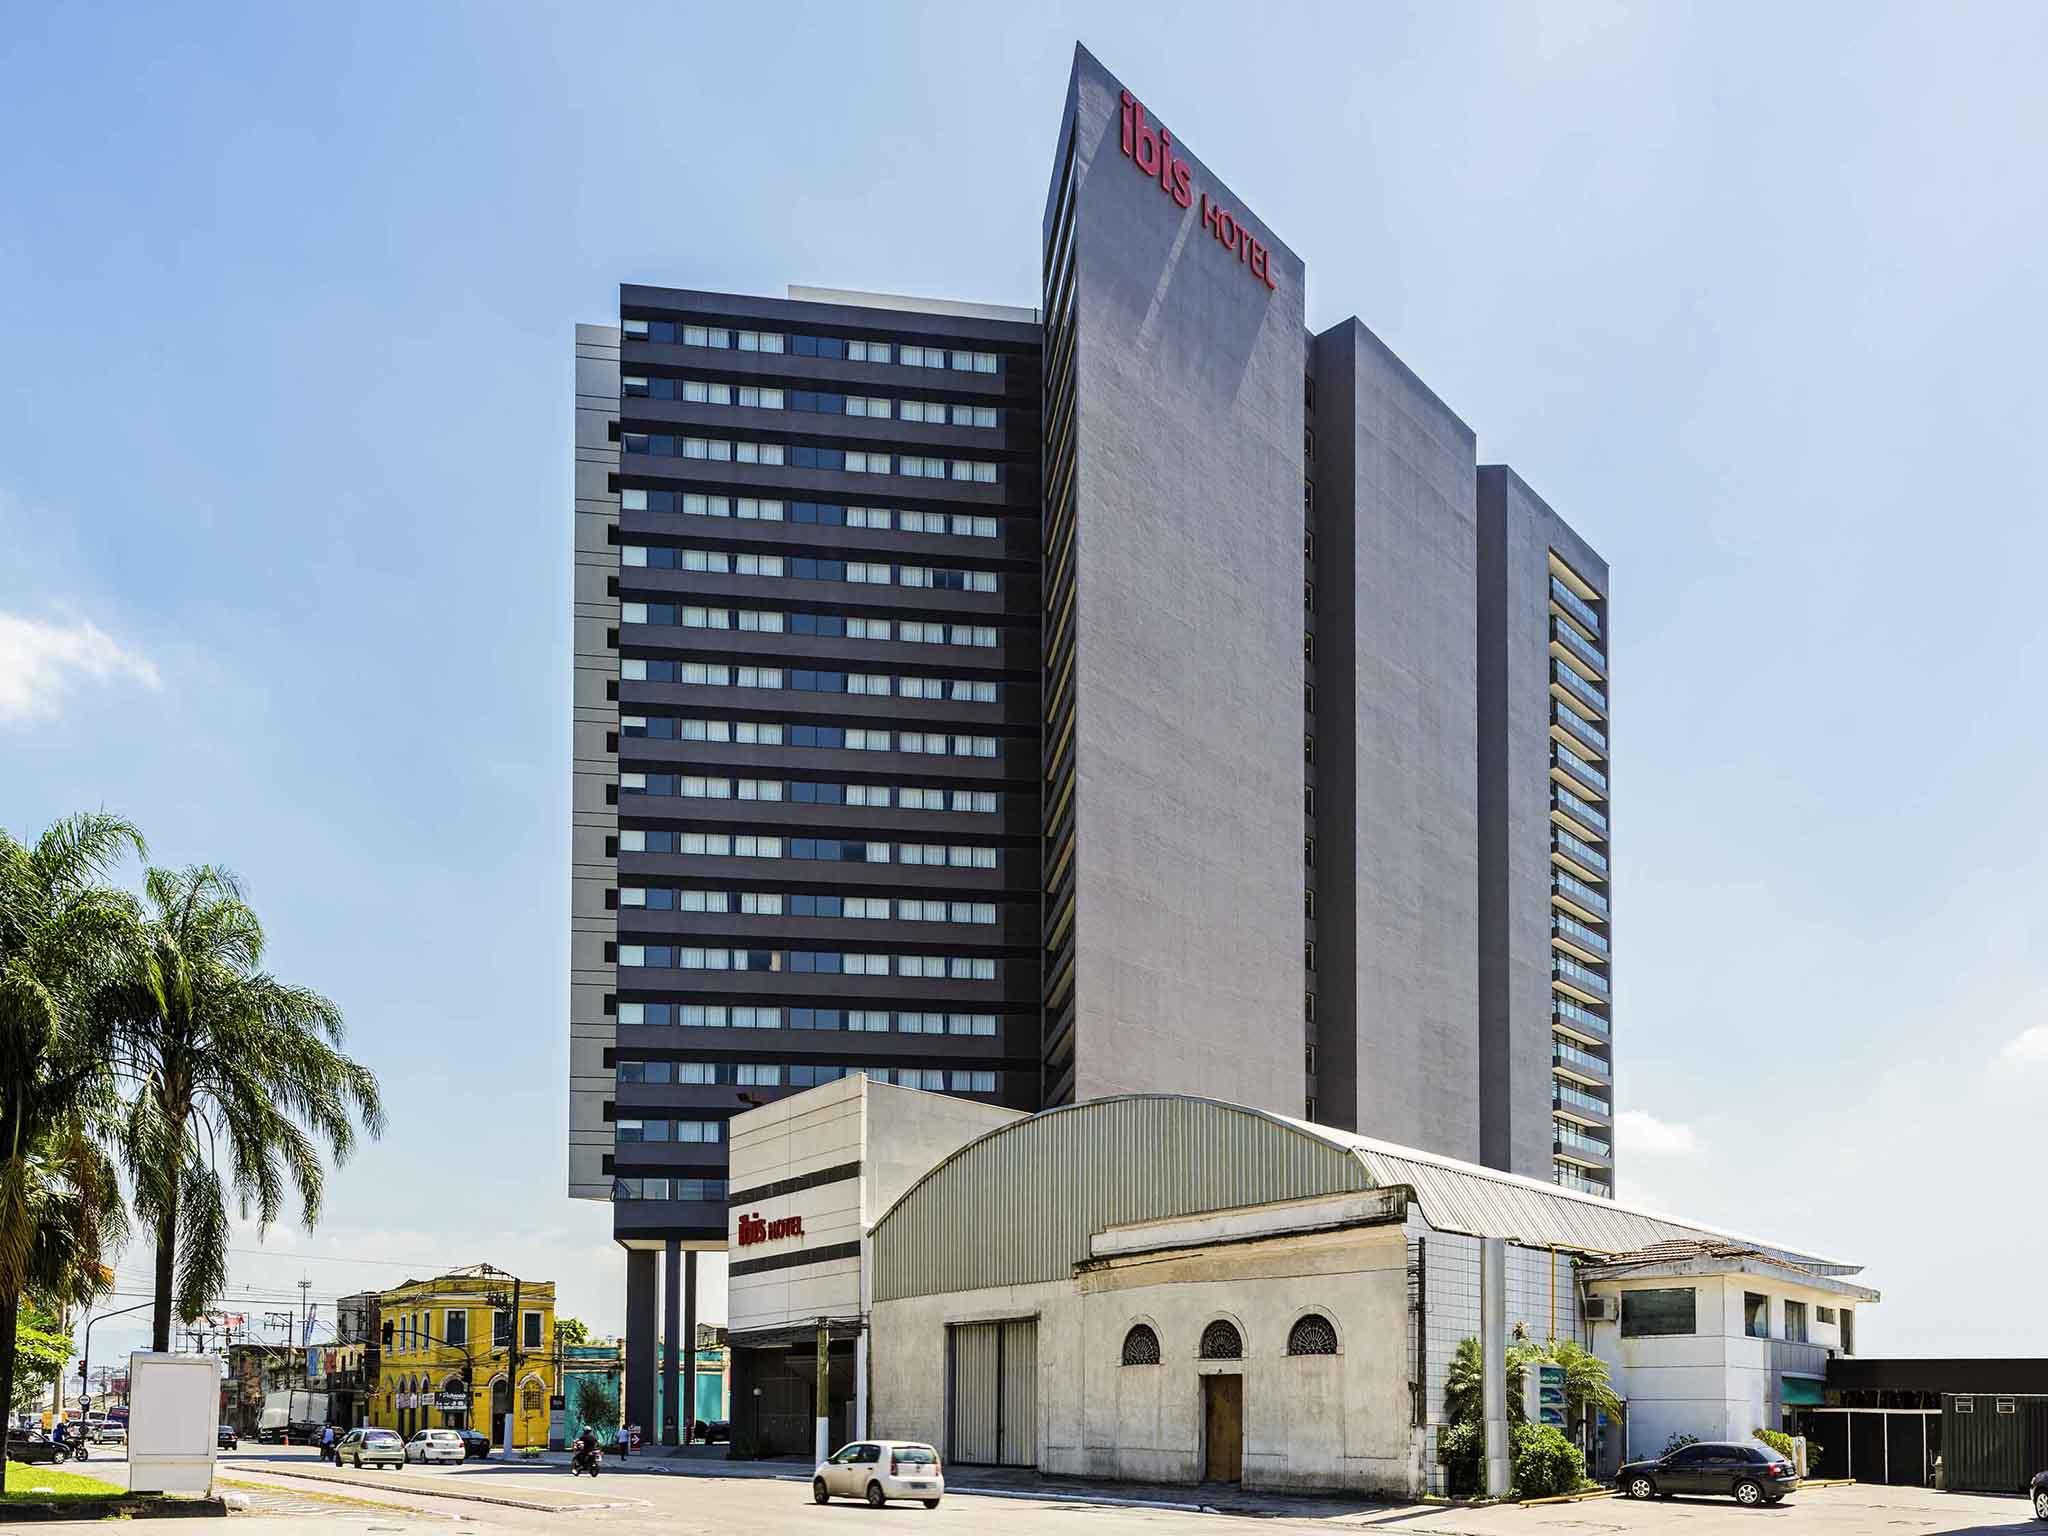 ead5a1ebe9 Hotel em SANTOS - ibis Santos Valongo